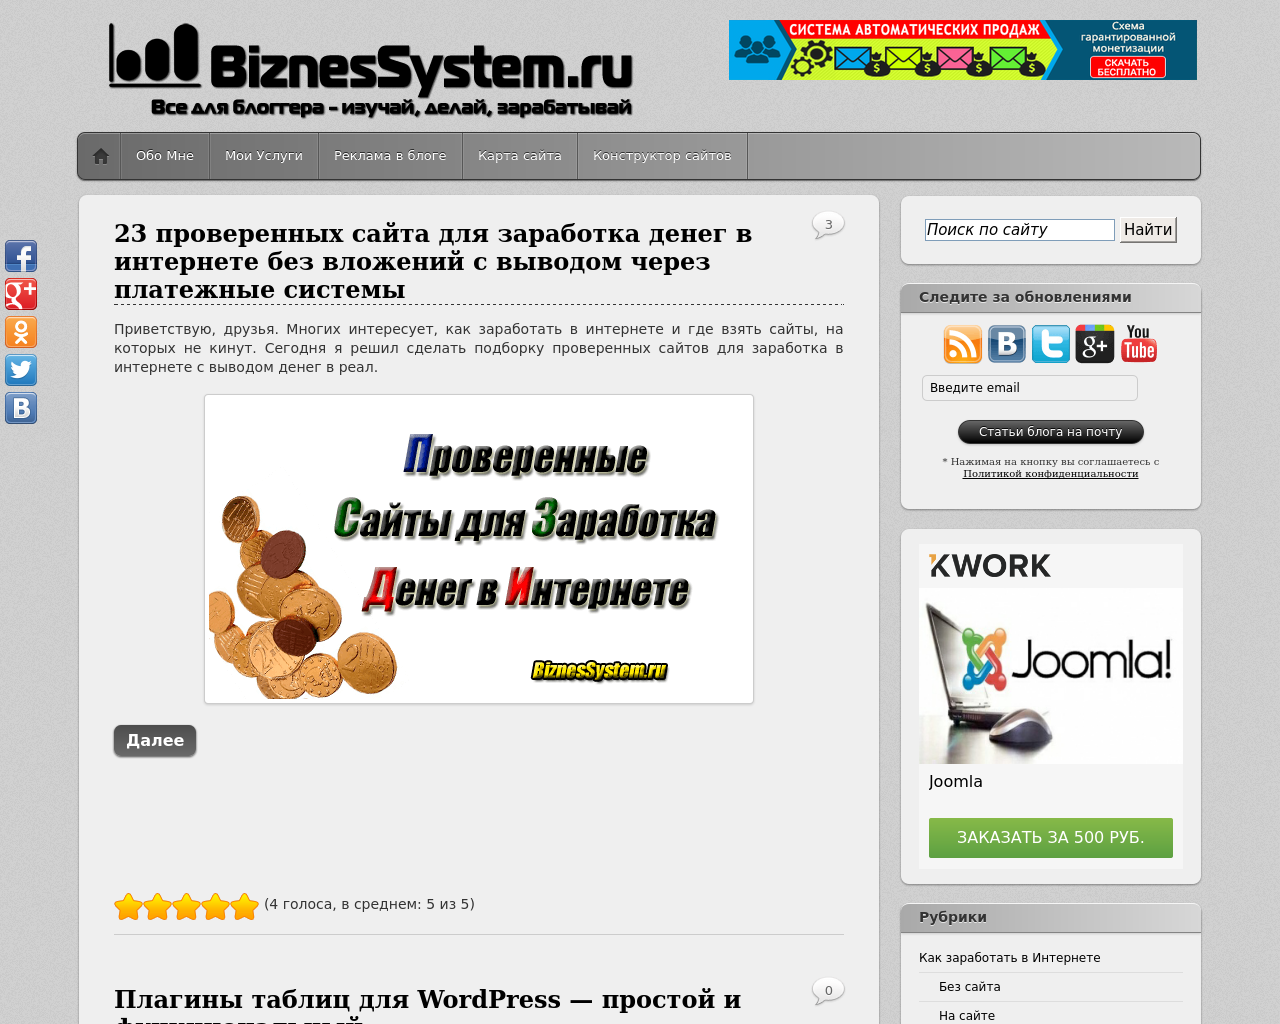 BiznesSystem.ru-Advertising-Reviews-Pricing